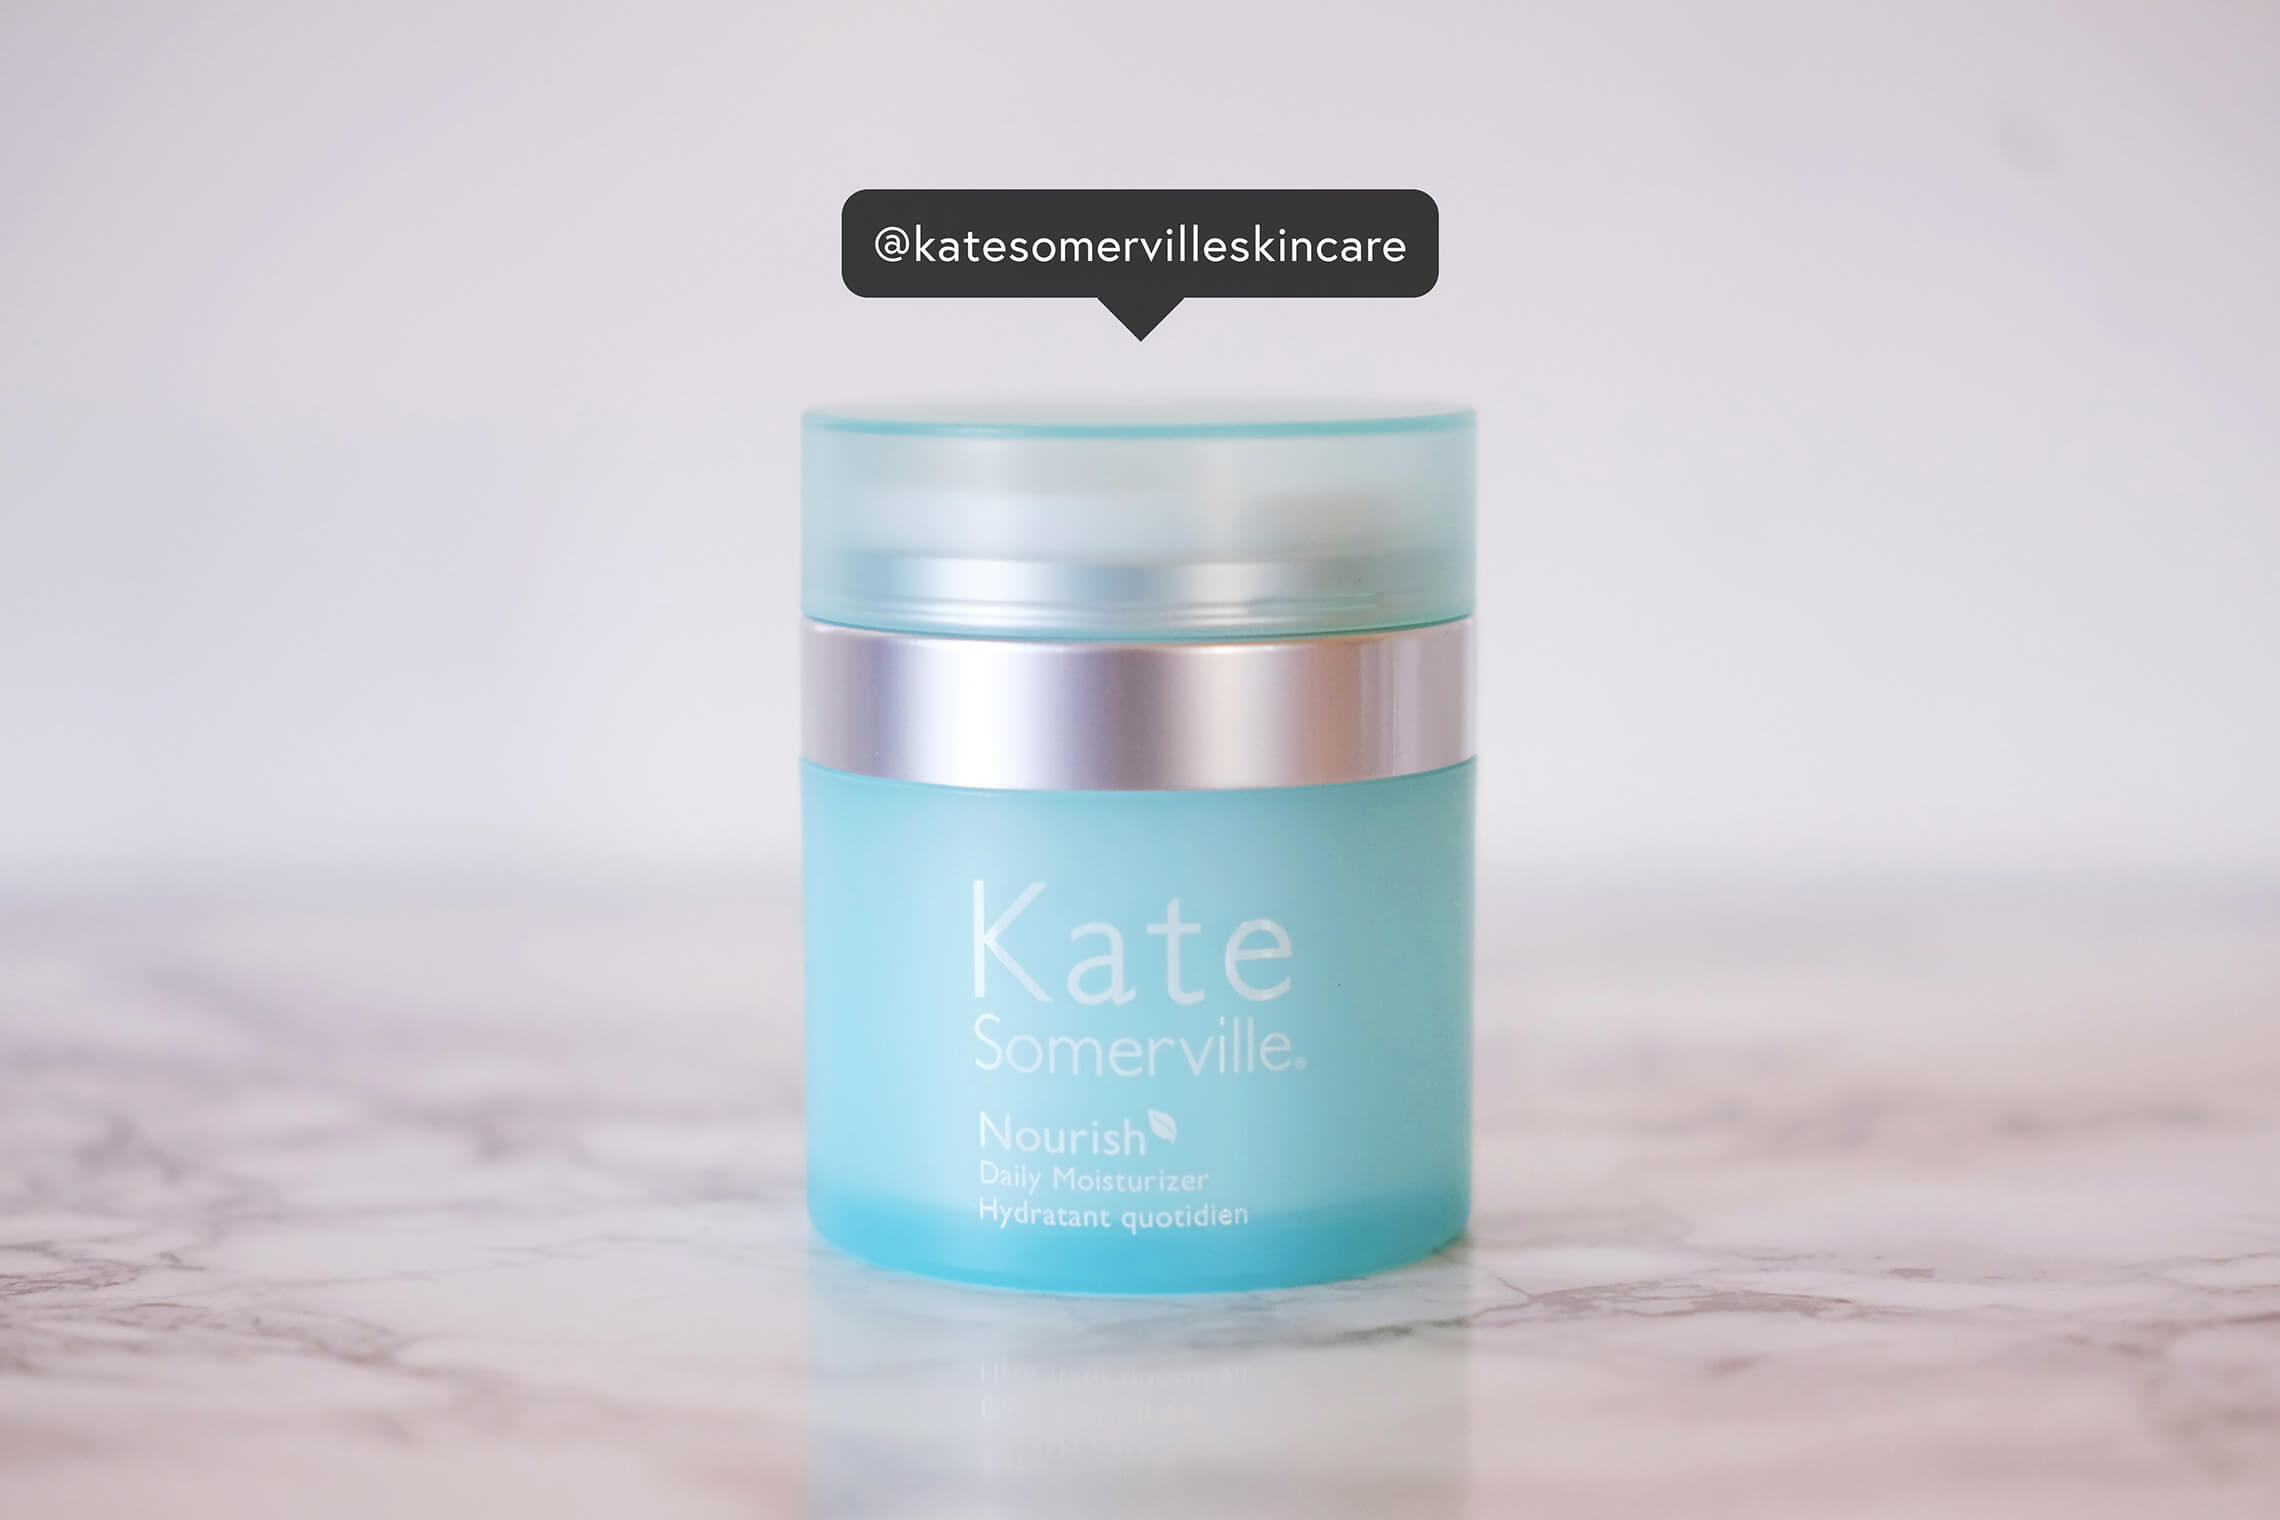 keiko lynn best skin care products 2018 kate somerville nourish moisturizer